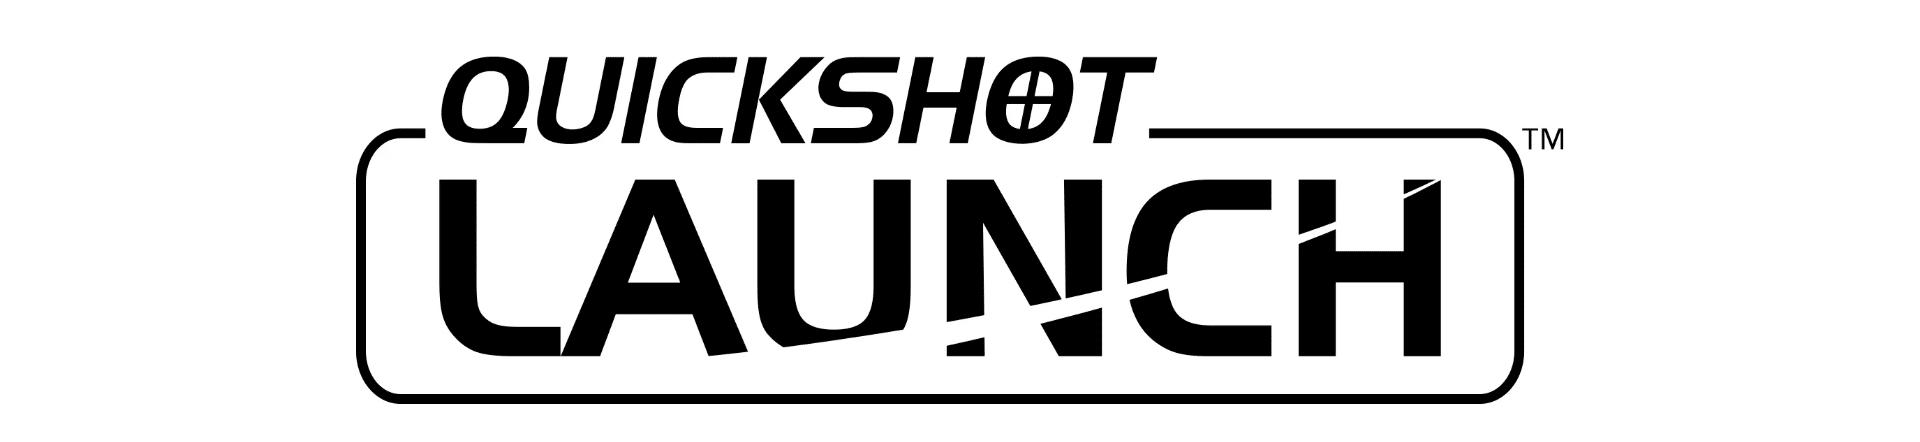 quickshot launch logo1